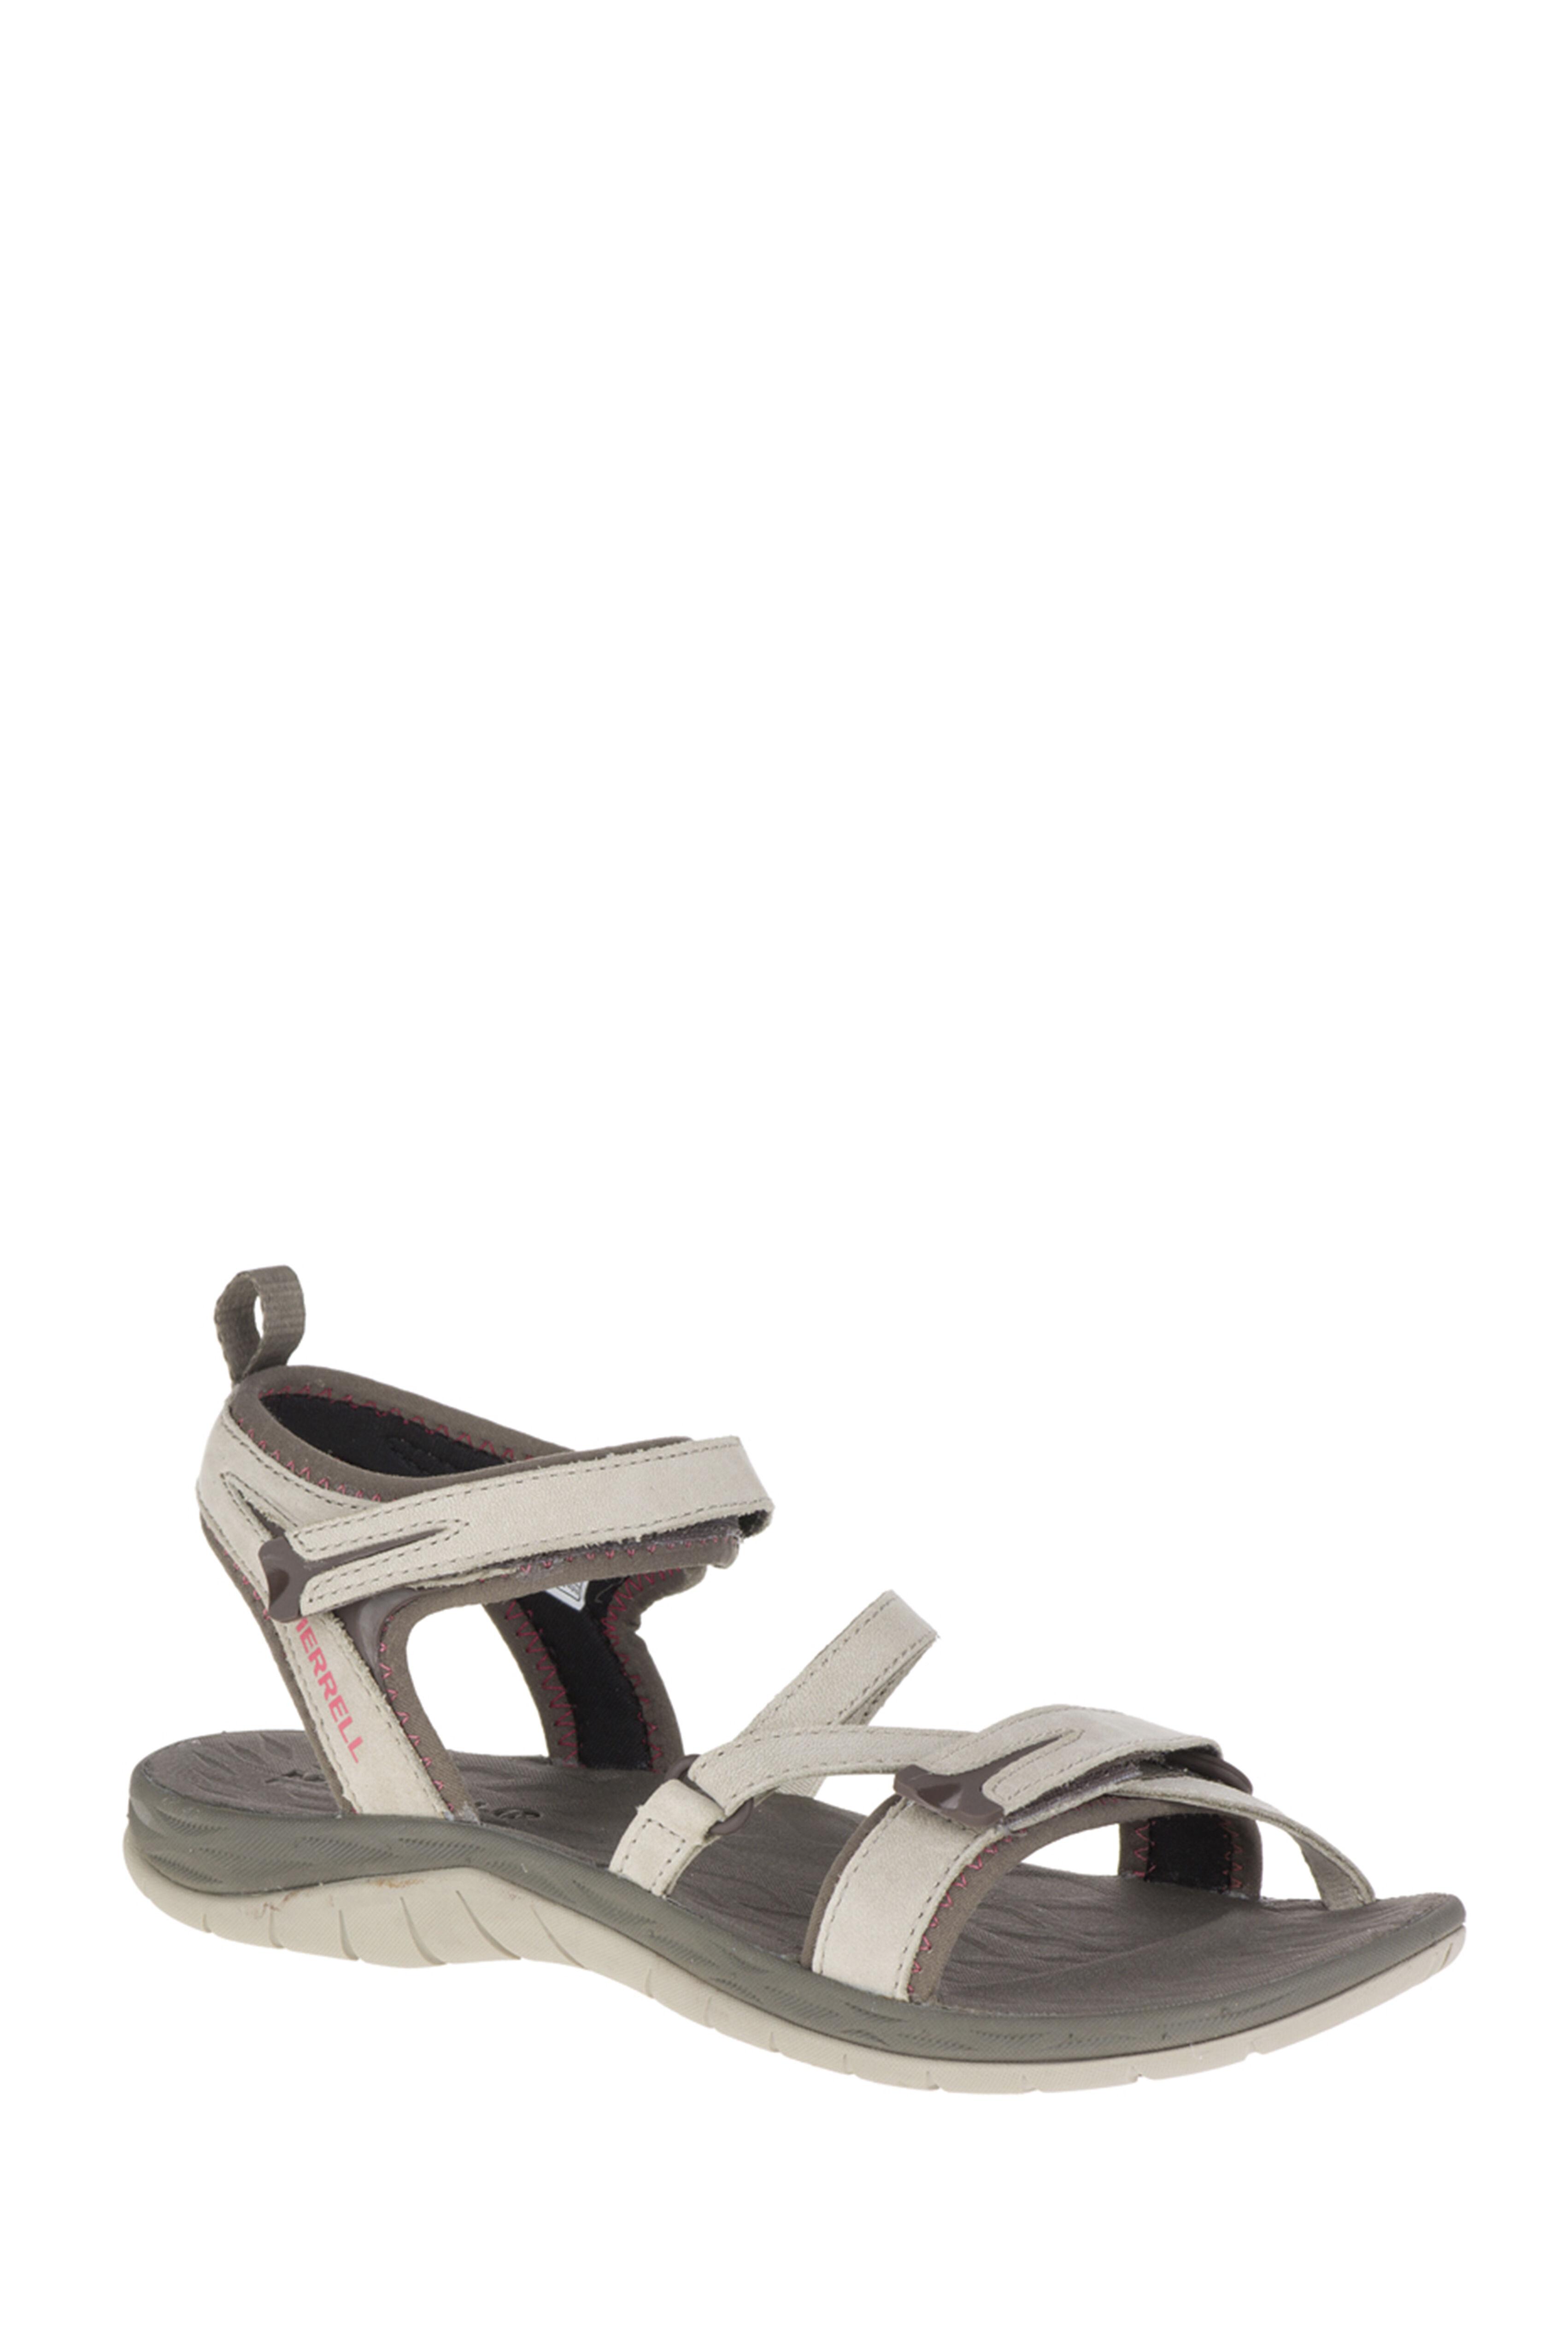 Strap Sandals Aluminium Siren Q2 Merrell Women's 80OnPNkXw